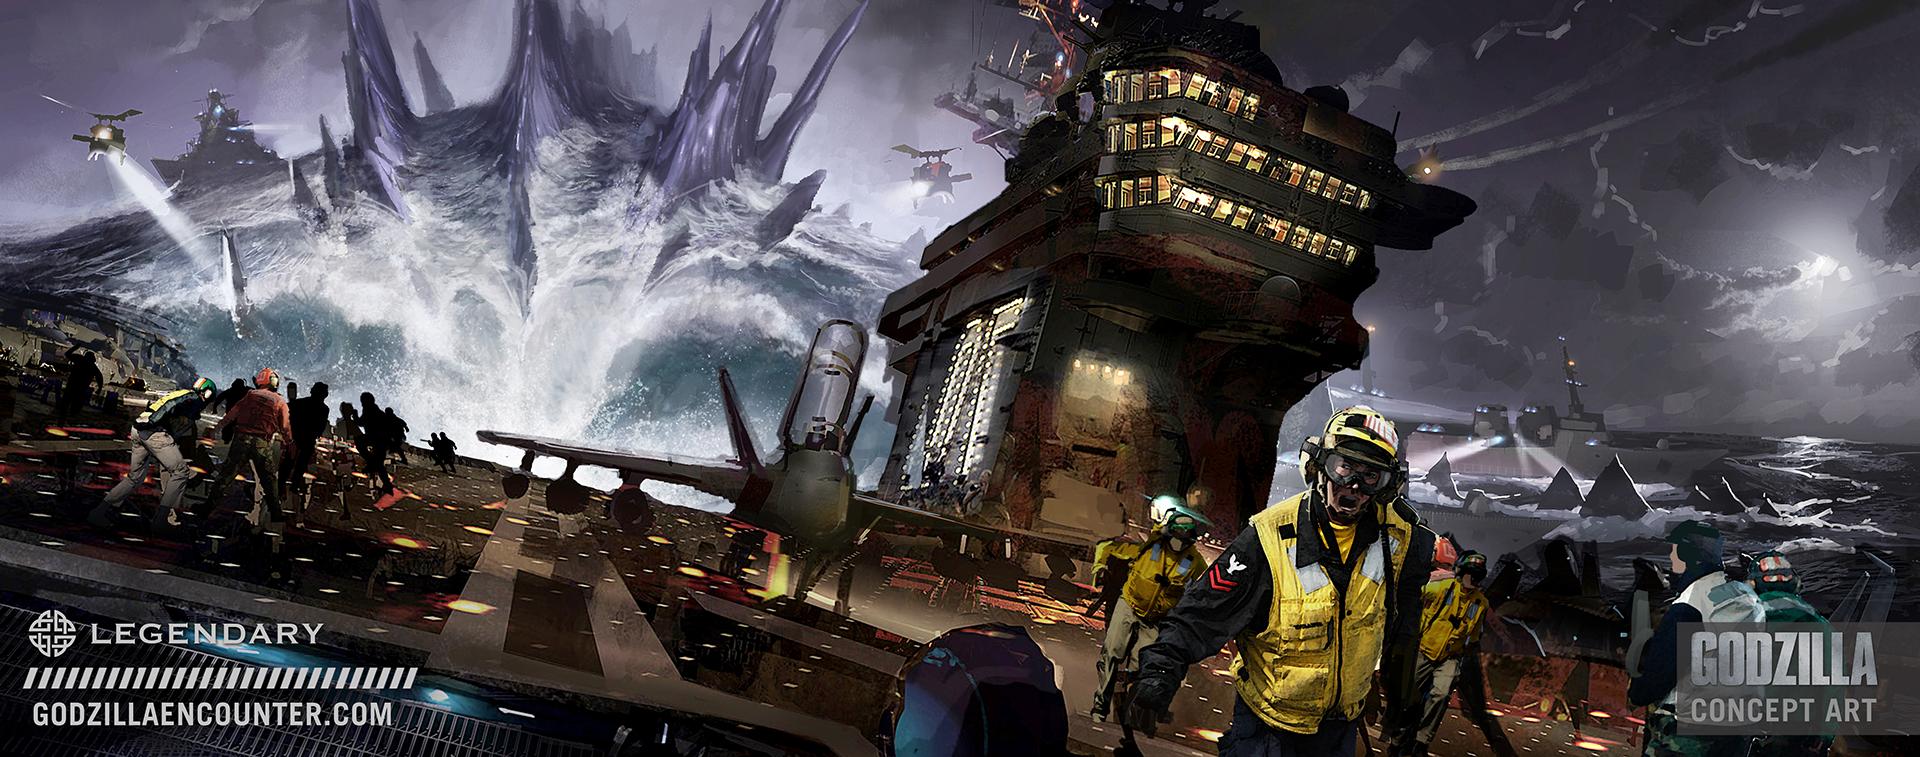 Godzilla-Concept-Art